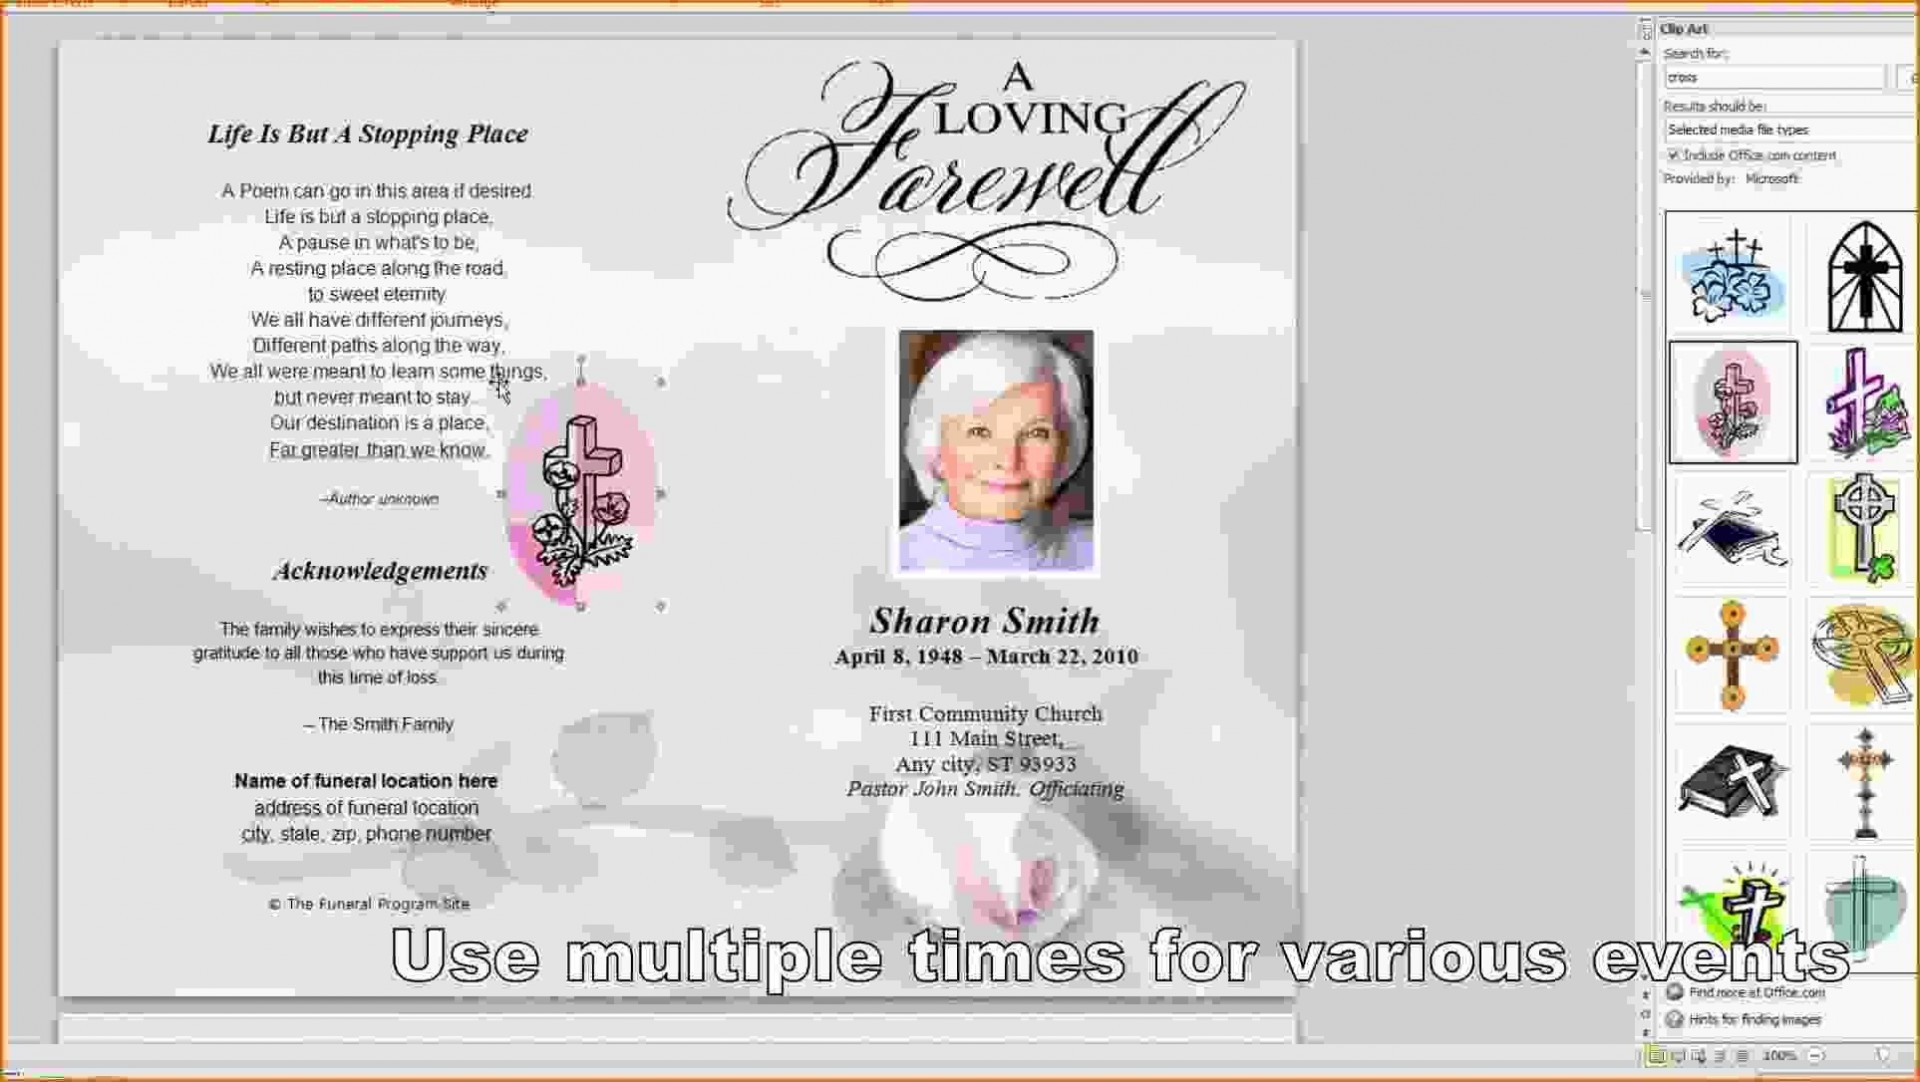 001 Top Memorial Card Template Free Download Concept 1920